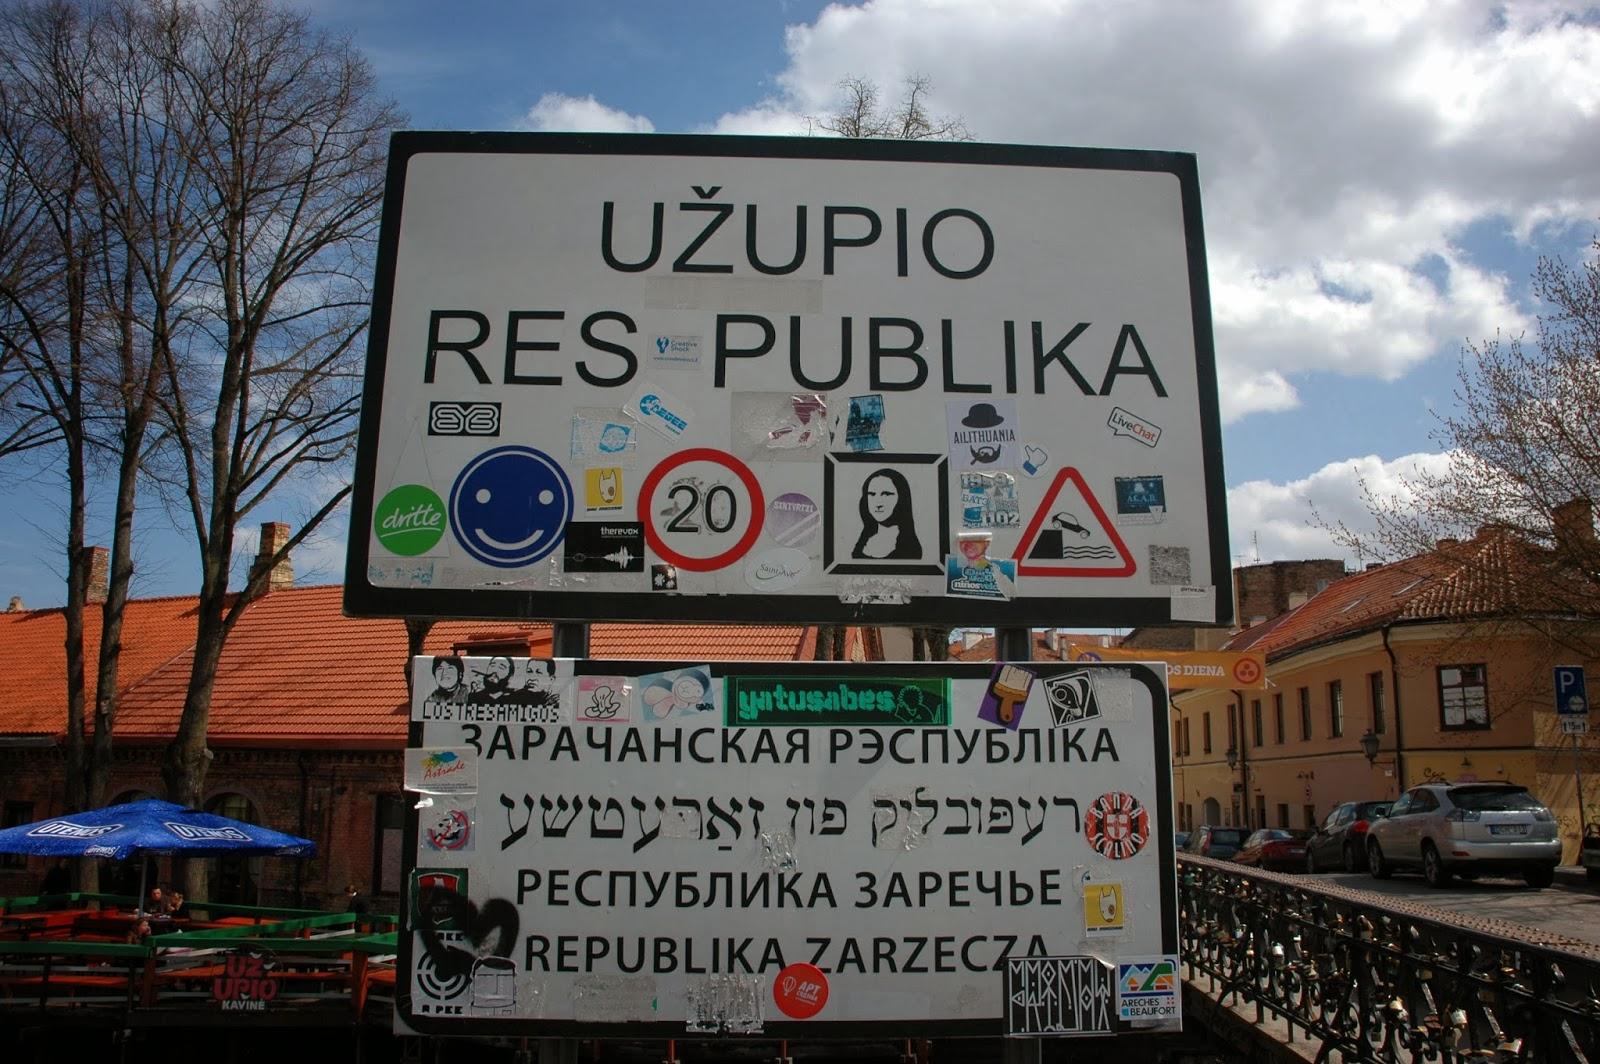 Republika Użupio